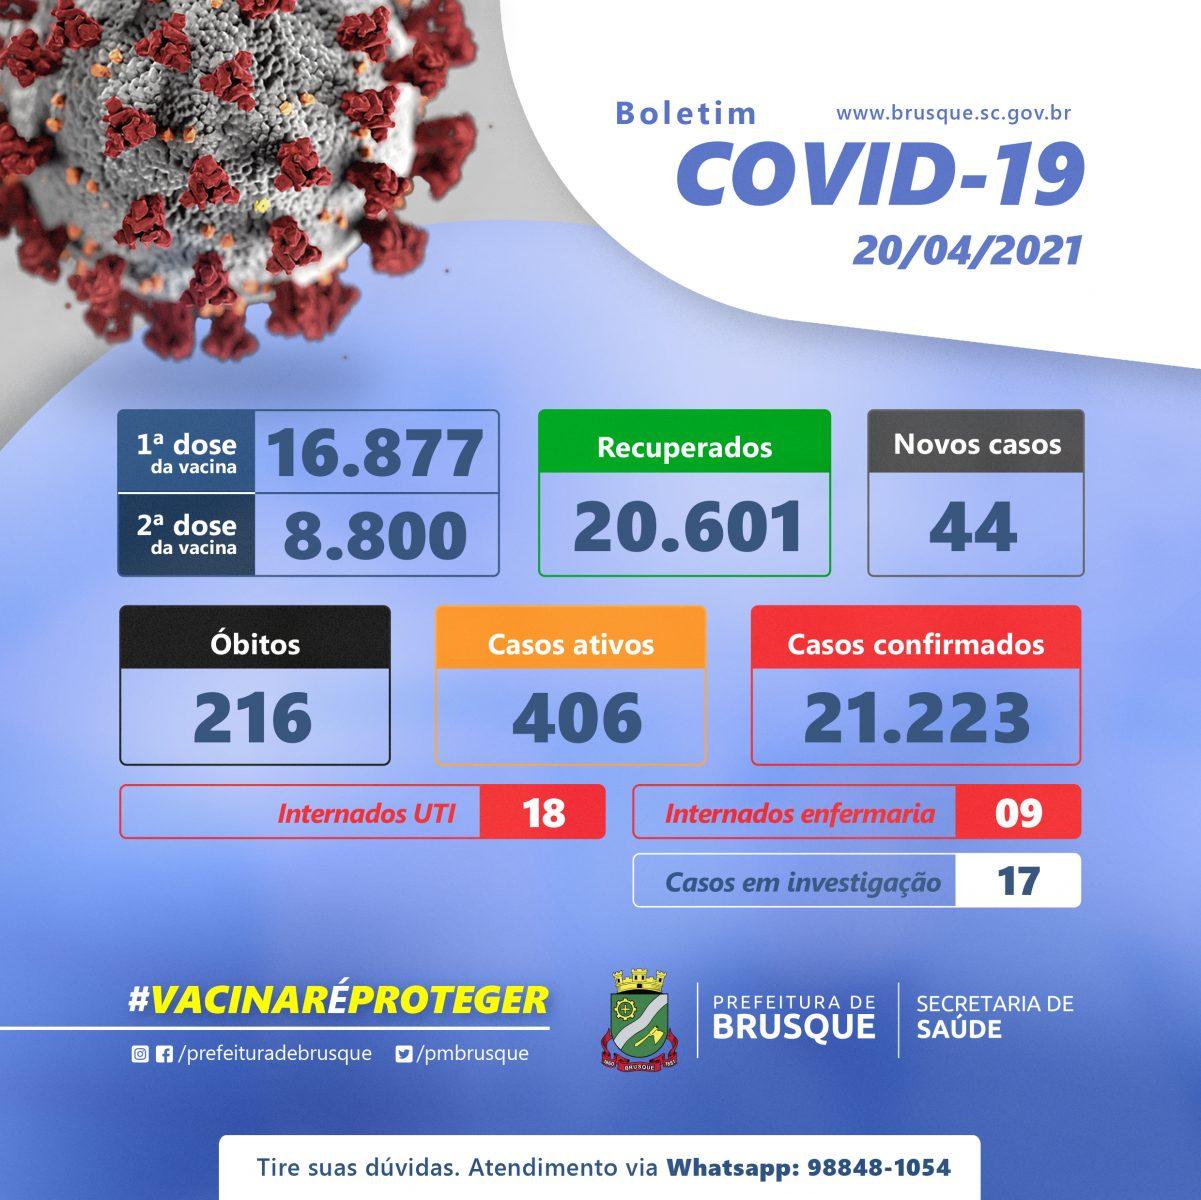 Covid 19: Confira o boletim epidemiológico desta terça-feira (20)